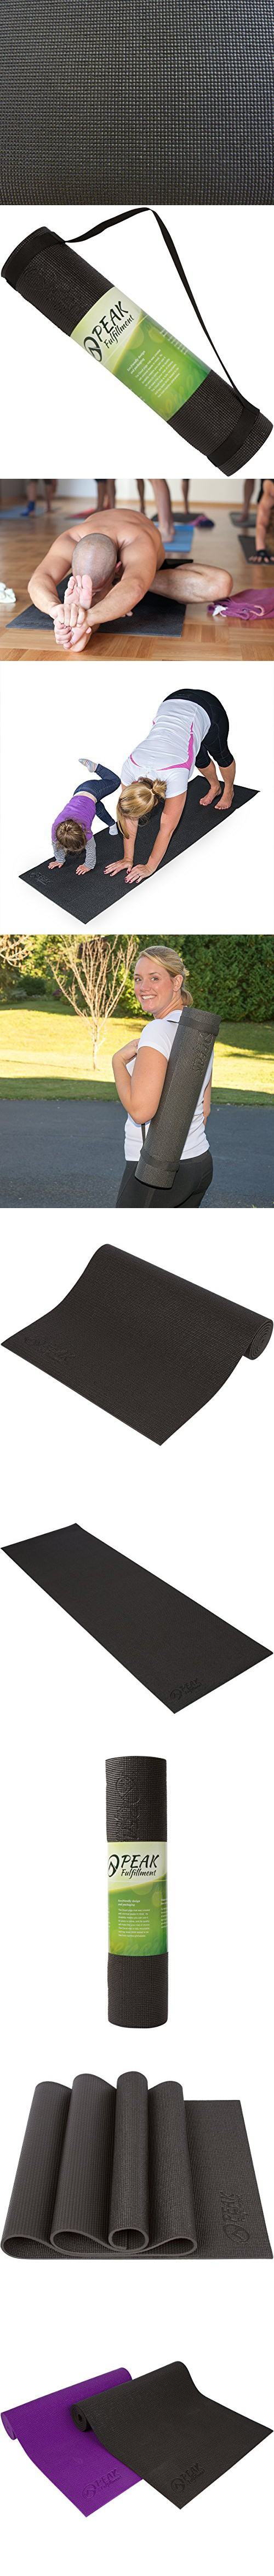 Peak Fulfillment 8mm 0 3 Inch Thick Non Slip Memory Foam Yoga Mat With Carrying Strap 76 Inch Black Yoga Store Yoga Mat Yoga